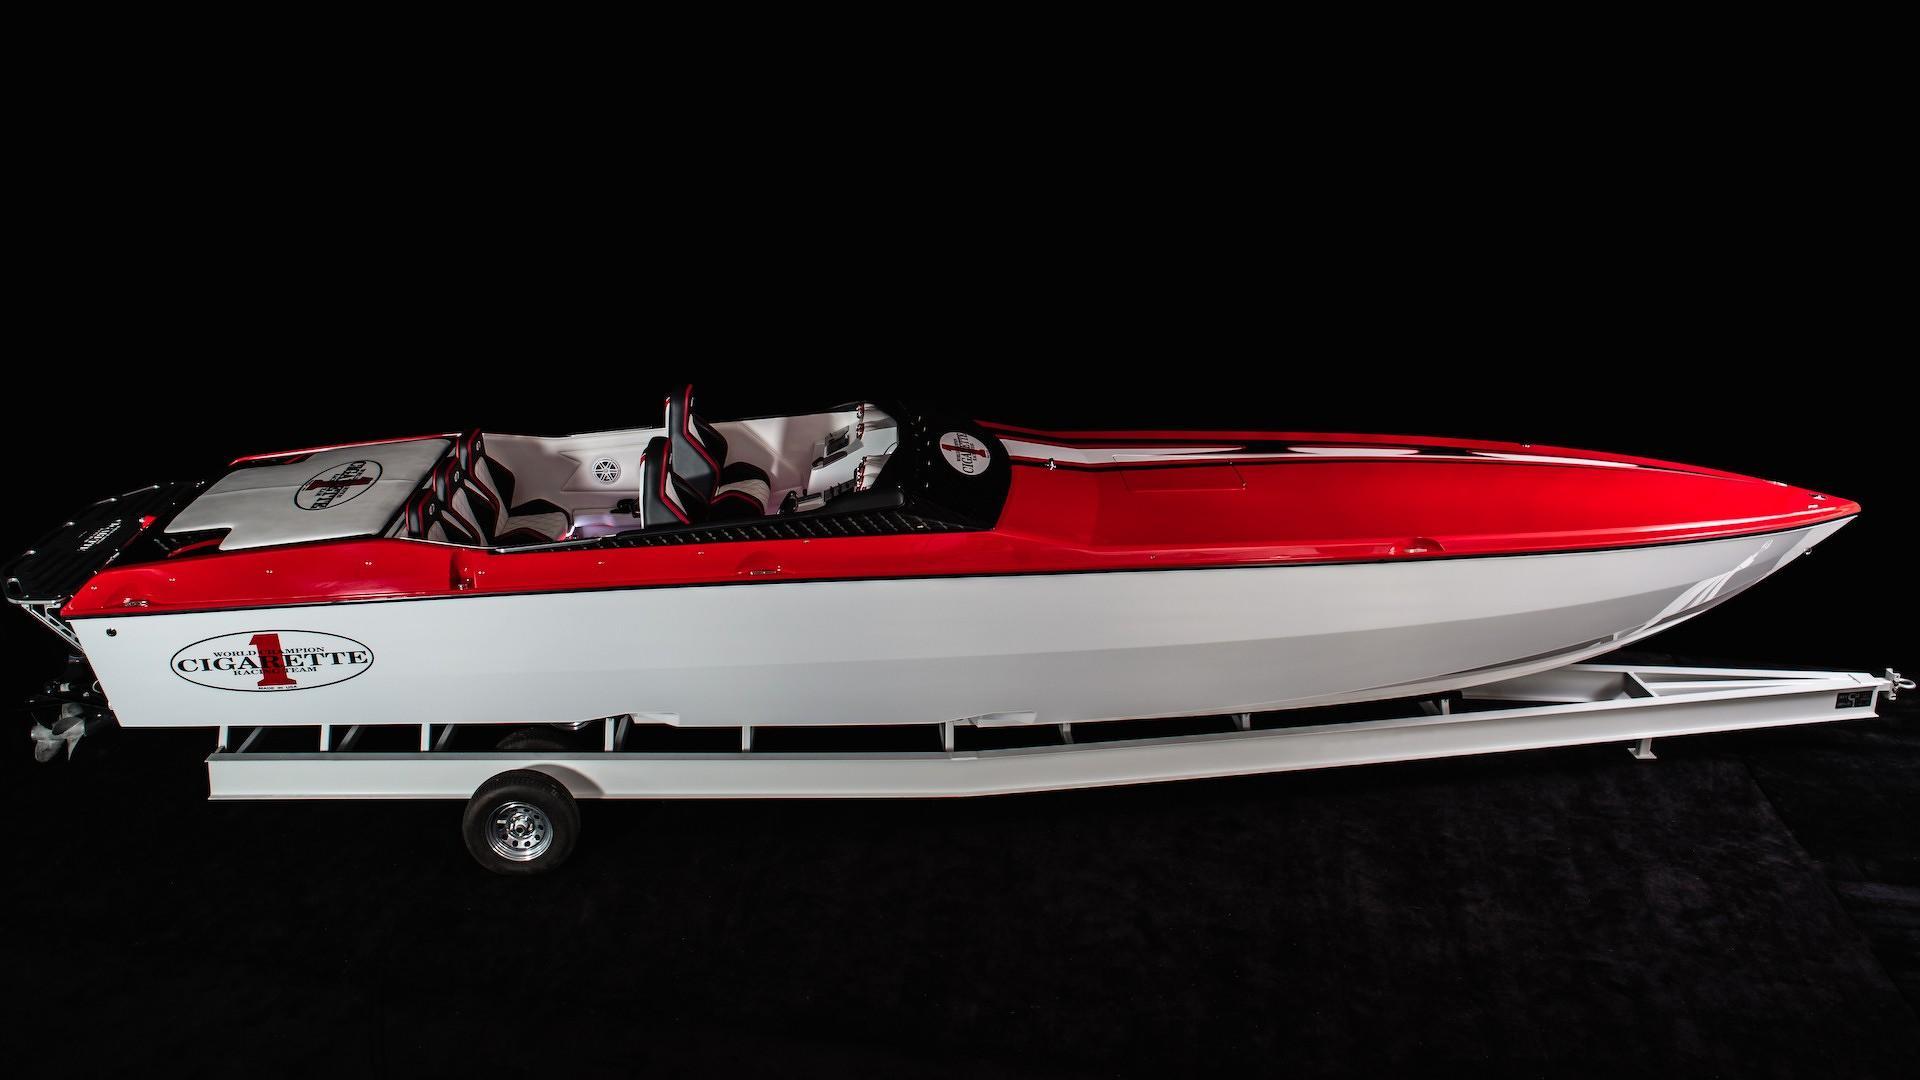 Top Gun Cigarette Boat | Motor1 com Photos